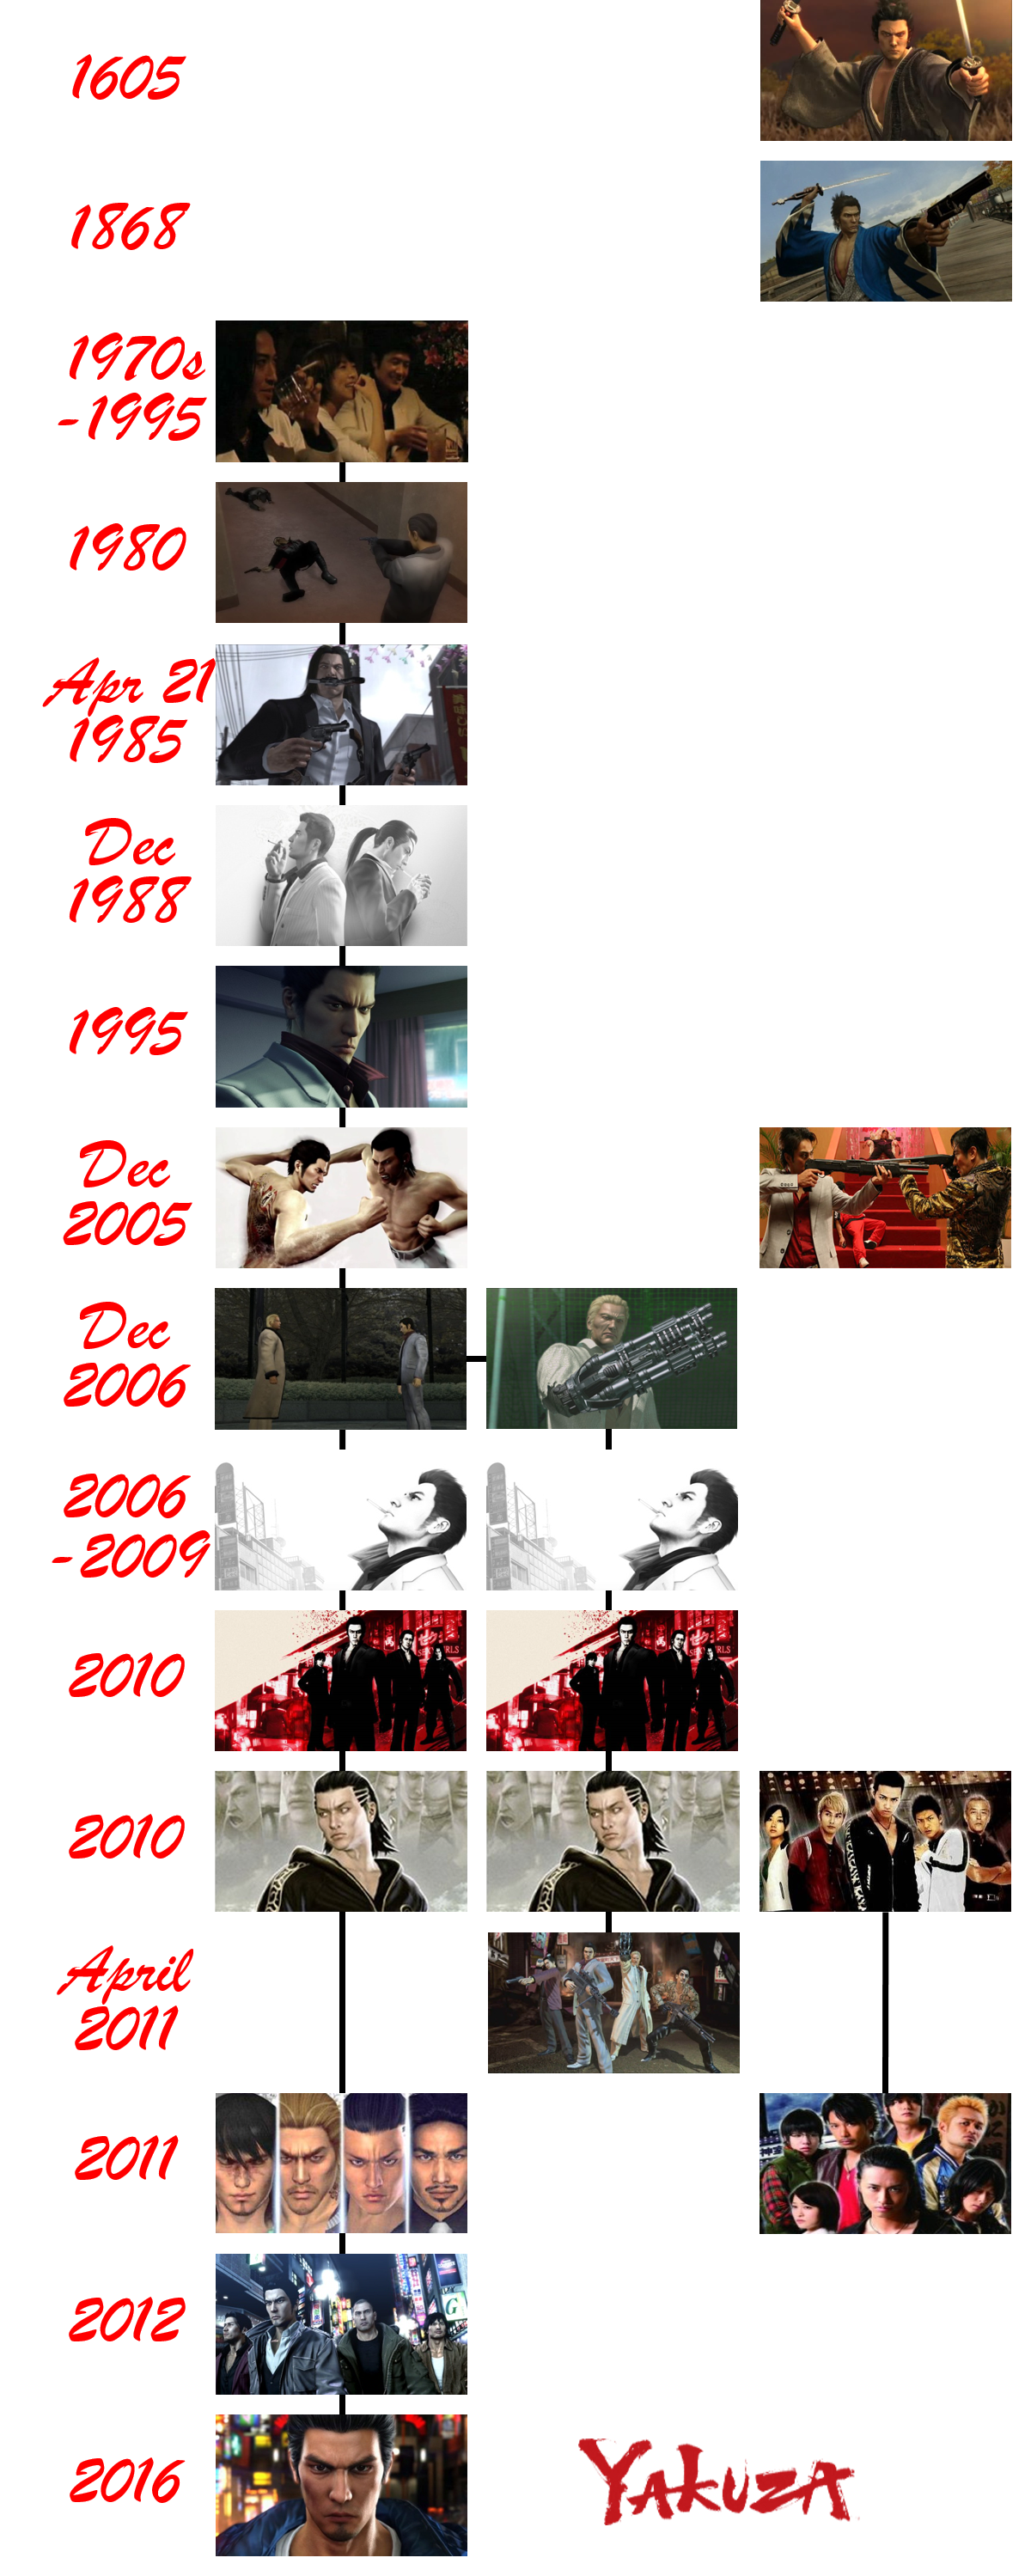 Yakuza Timeline By The4thsnake On Deviantart